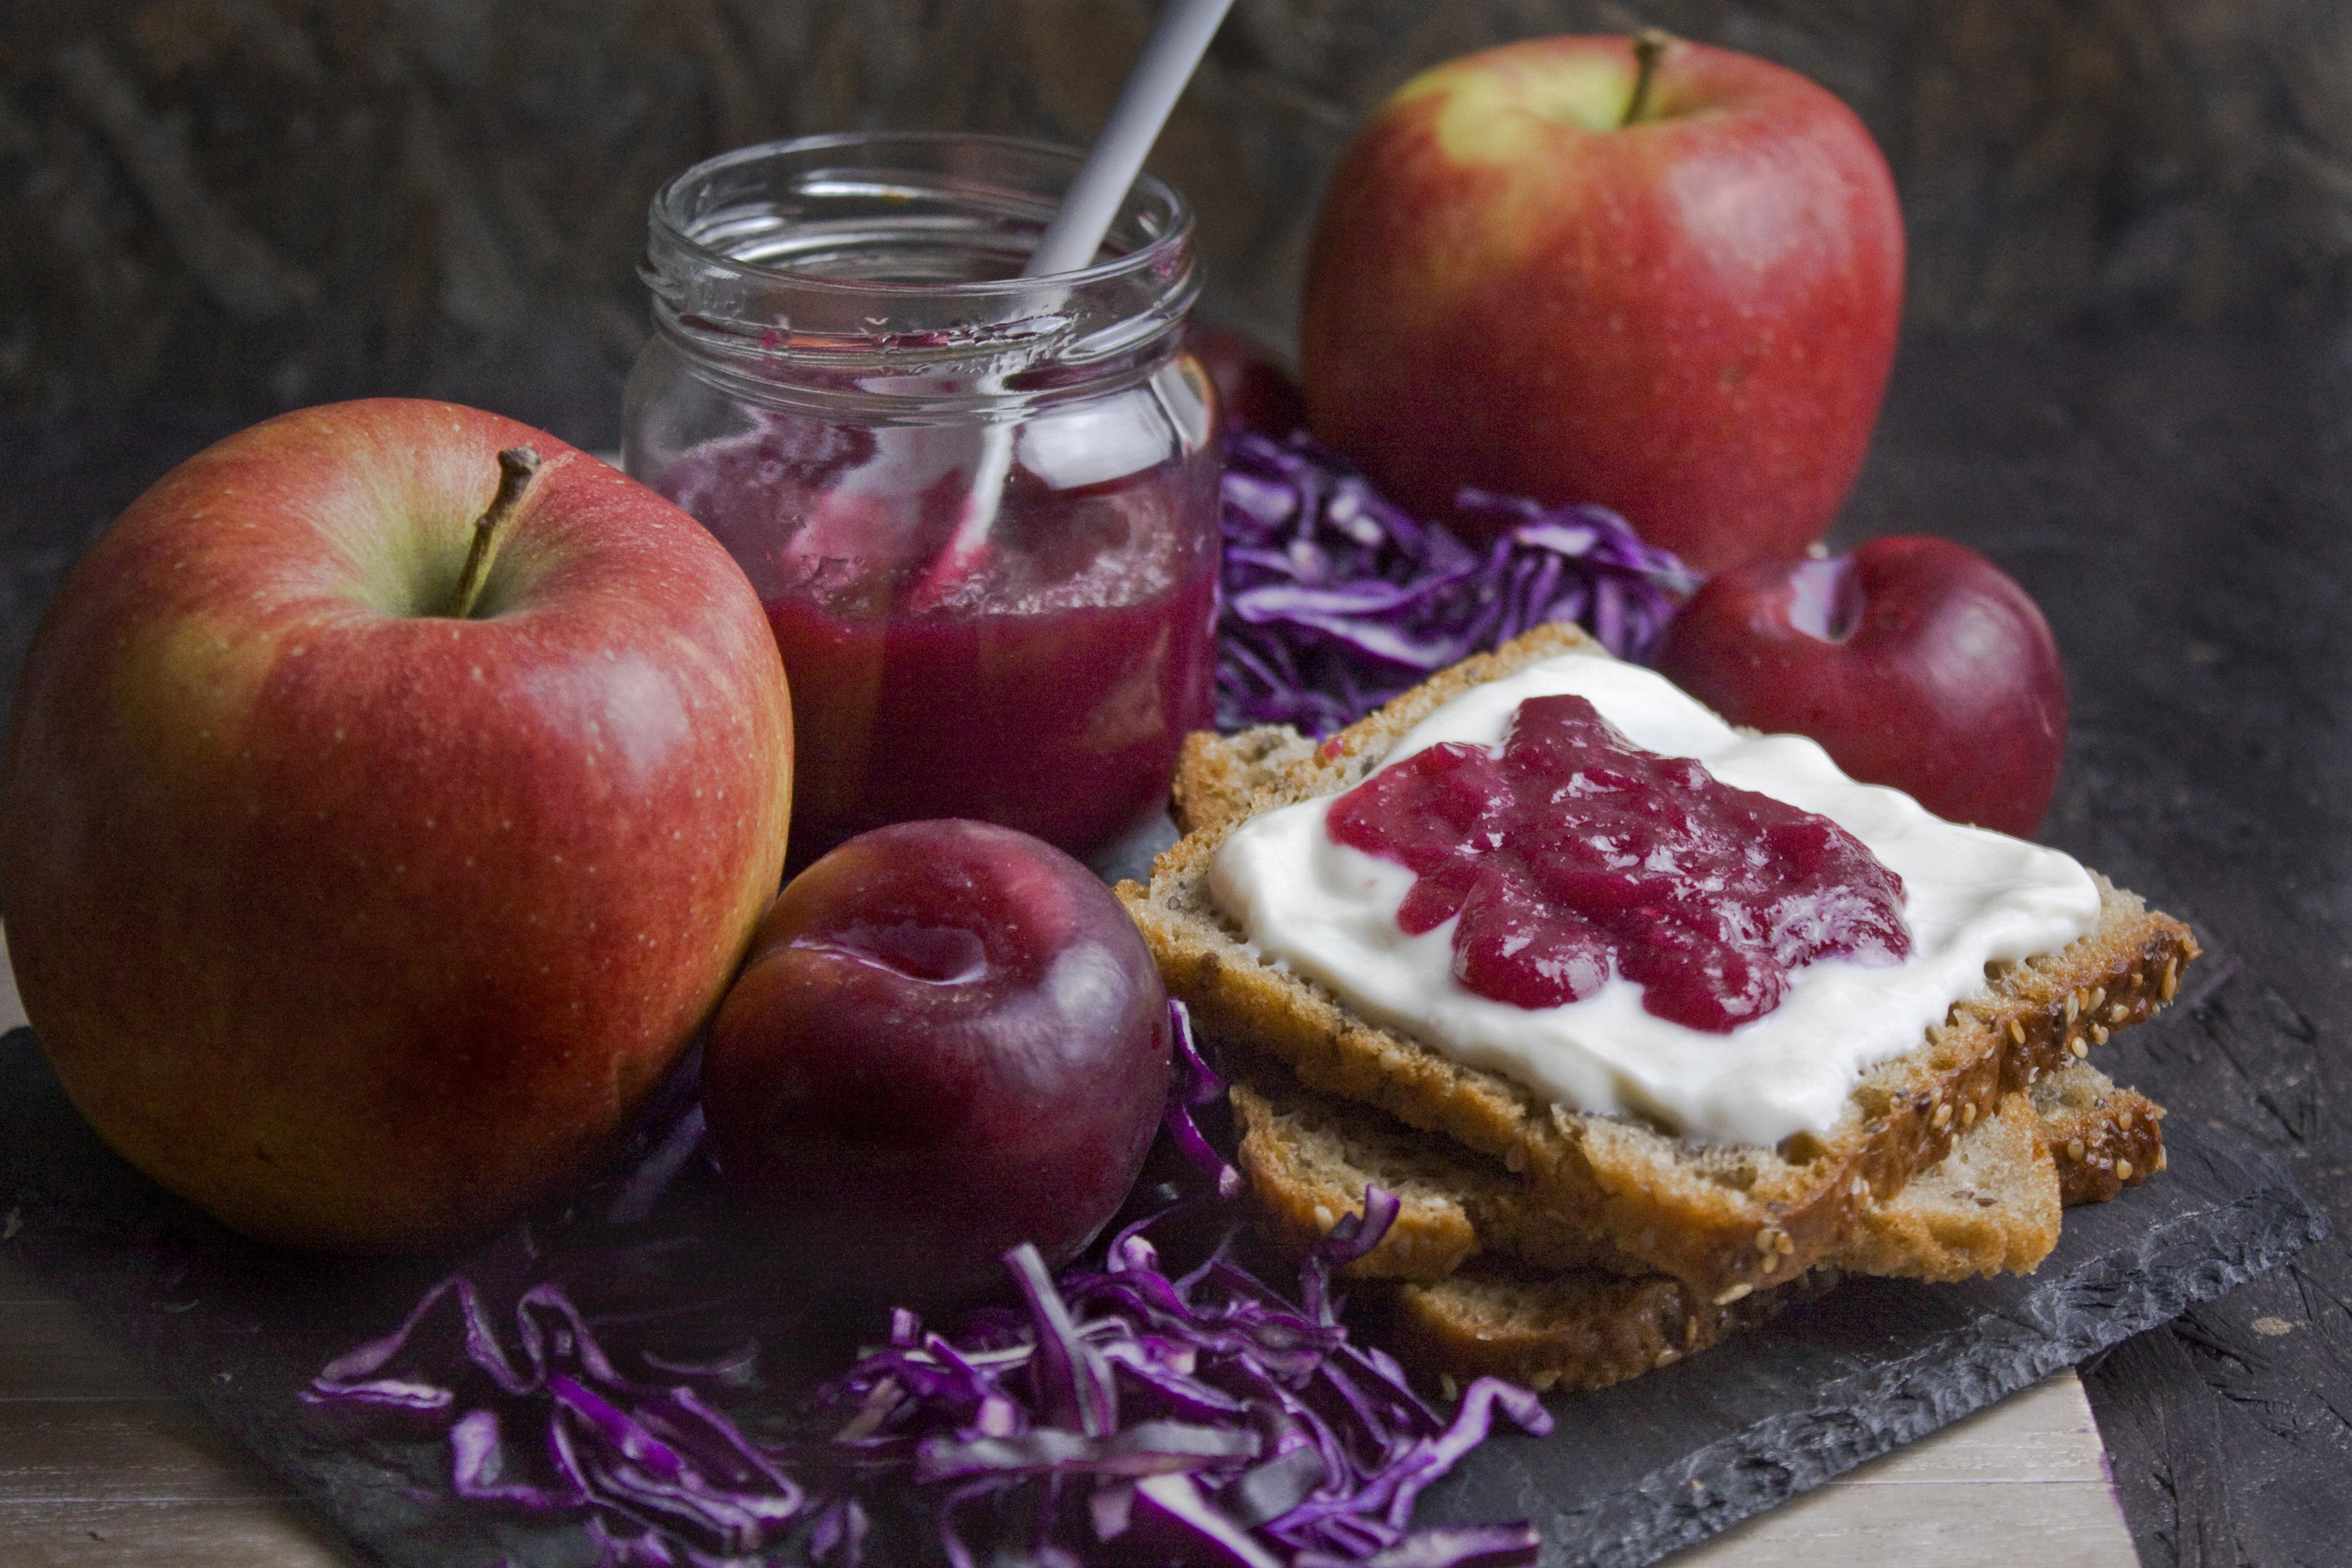 Rotkohl-Marmelade mit Apfel und Pflaume